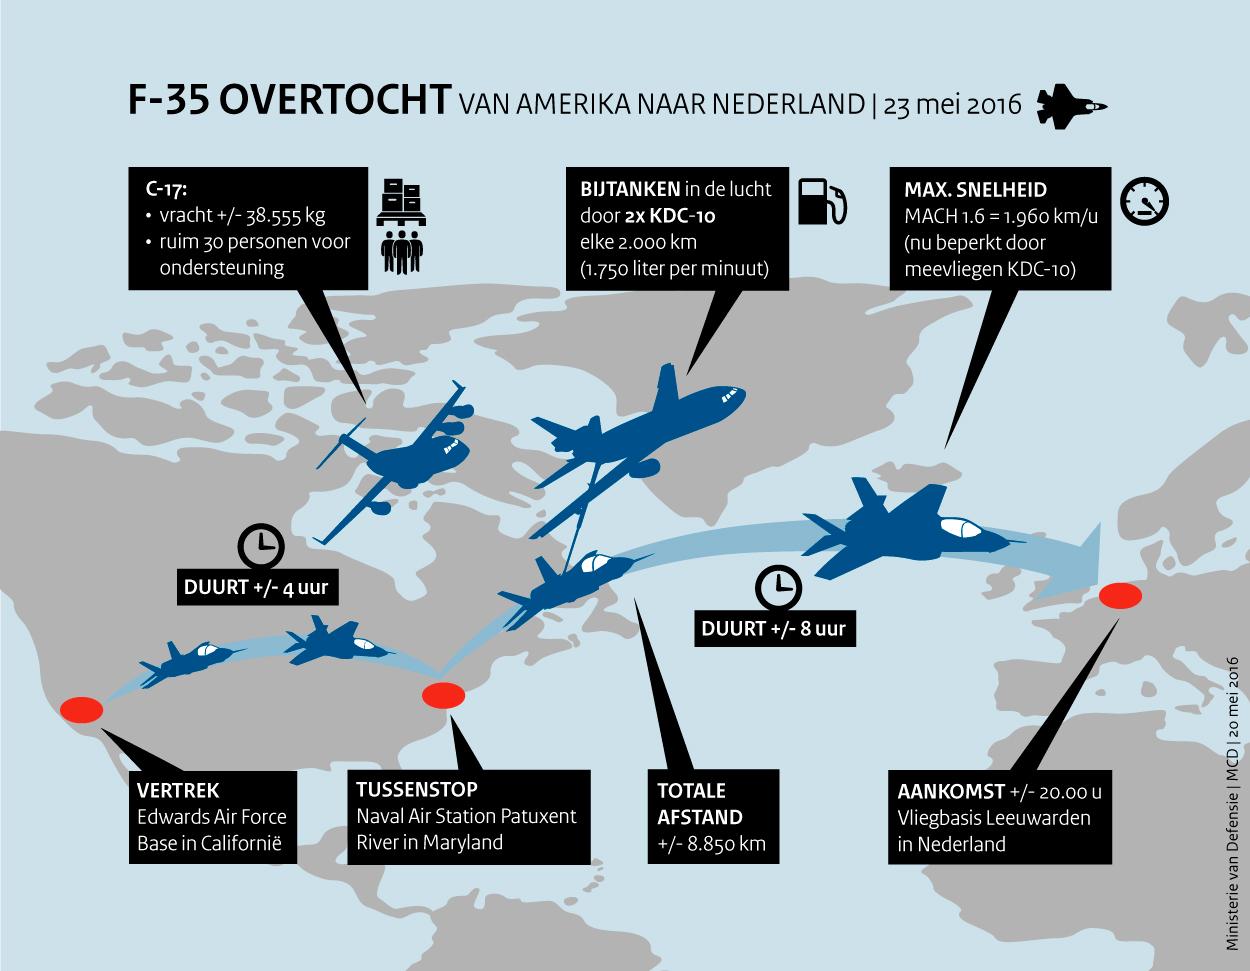 201650259-infographic-f-35-overtocht-us-leeuwarden.jpg